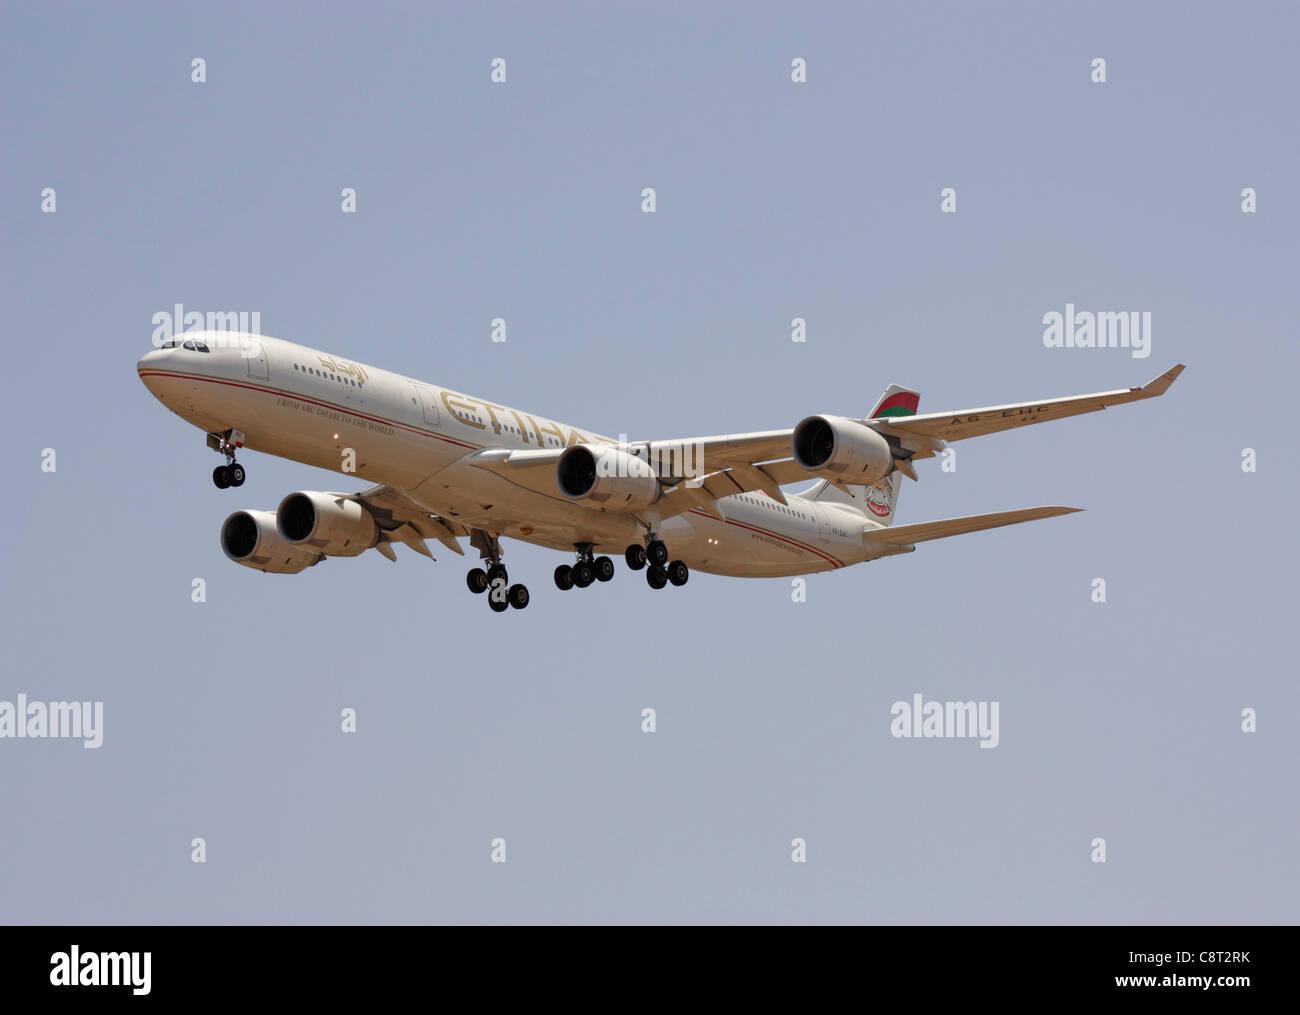 Etihad Airways Airbus A340-500 4-Motor Jet Airliner Ansatz. Fernverkehr kommerziellen Flug. Stockbild